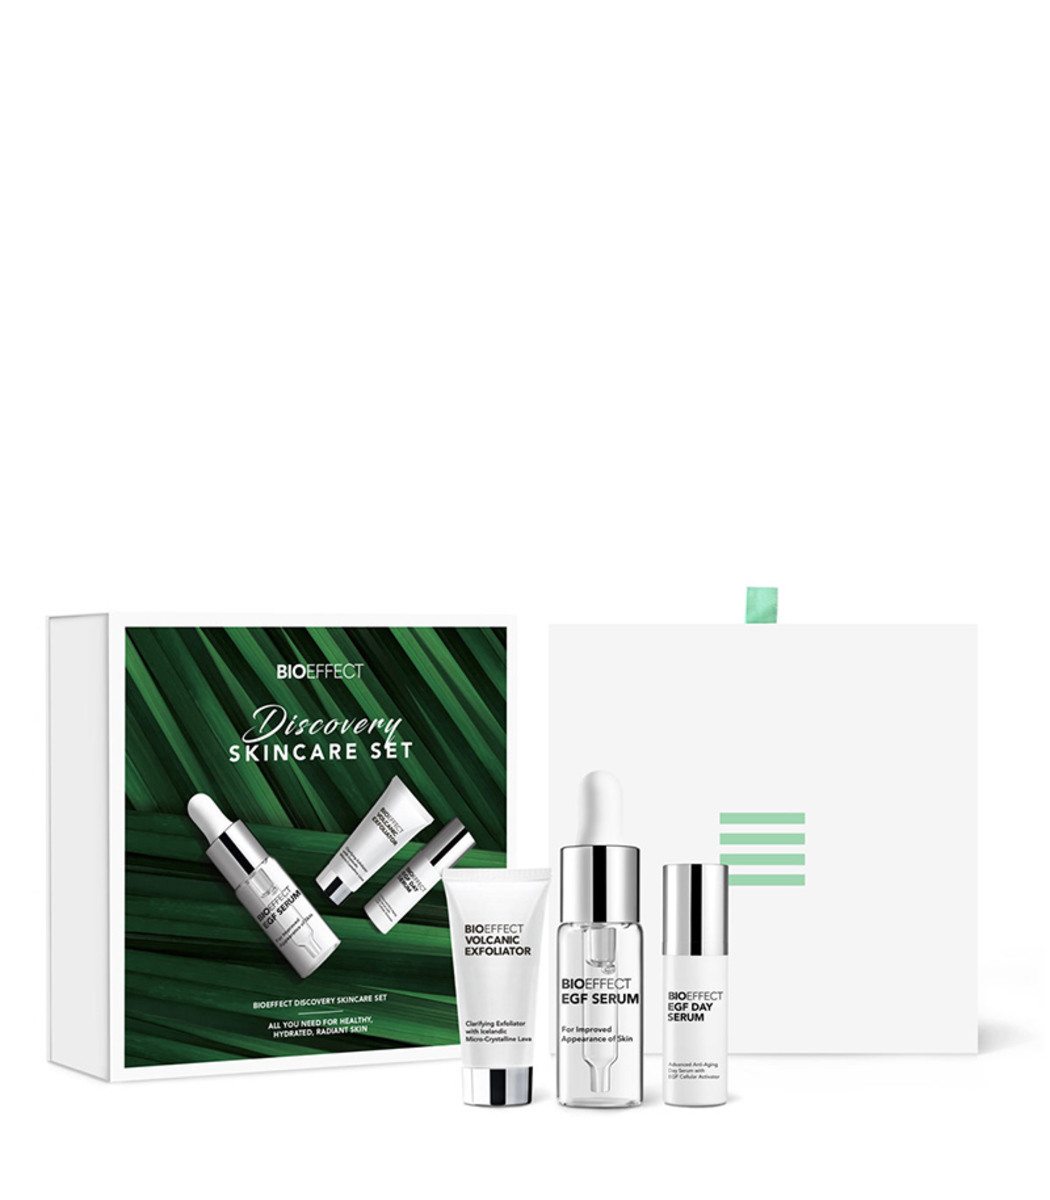 BIOEFFECT Discovery Skincare Set